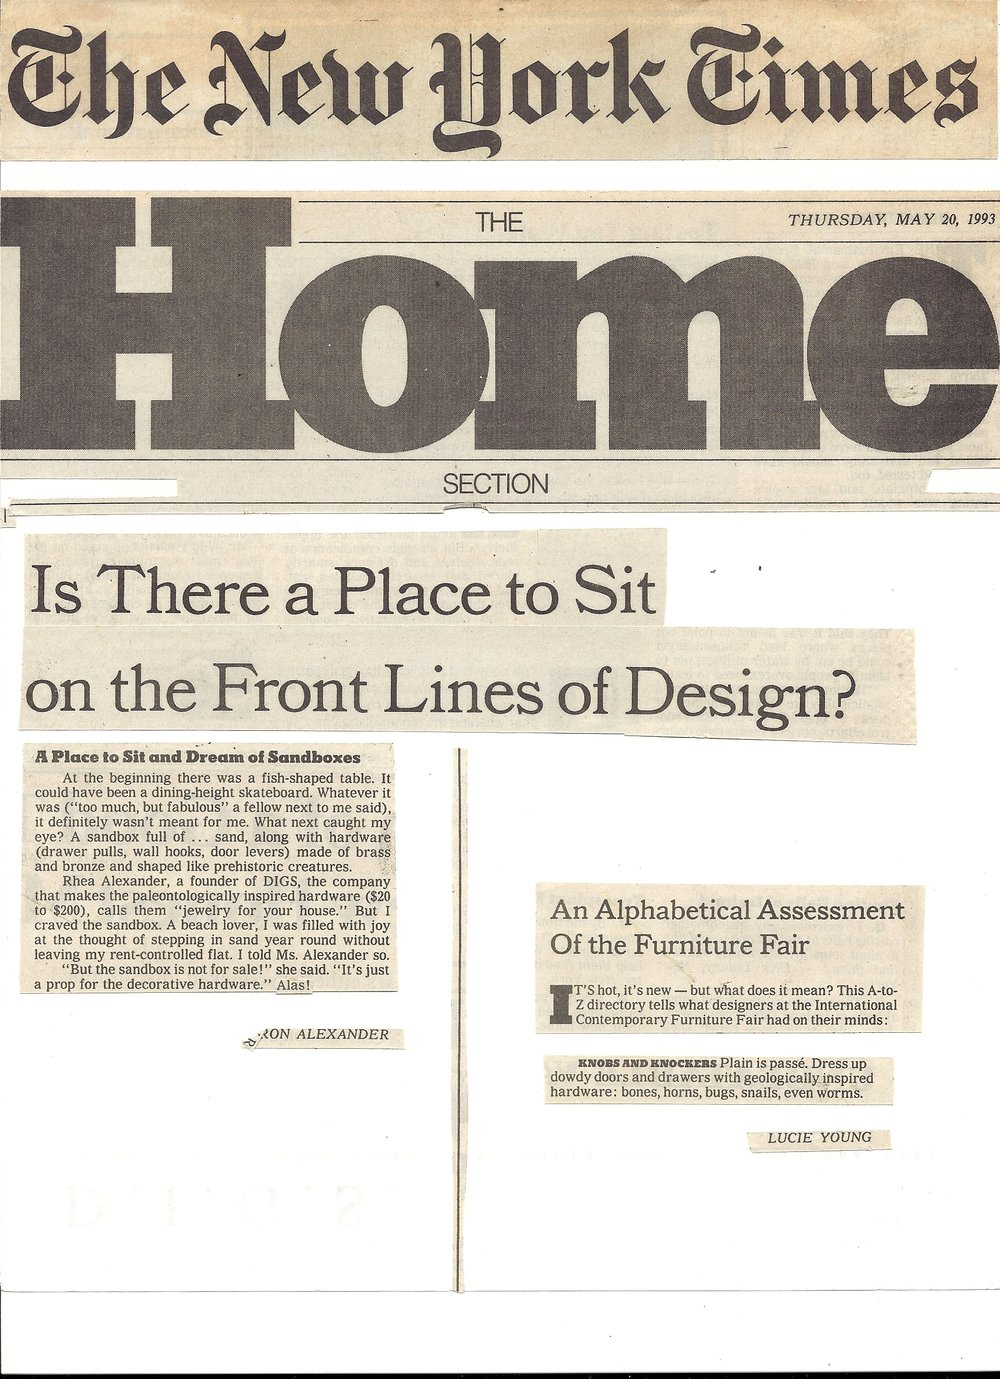 NYTimes0003 - Copy.jpg